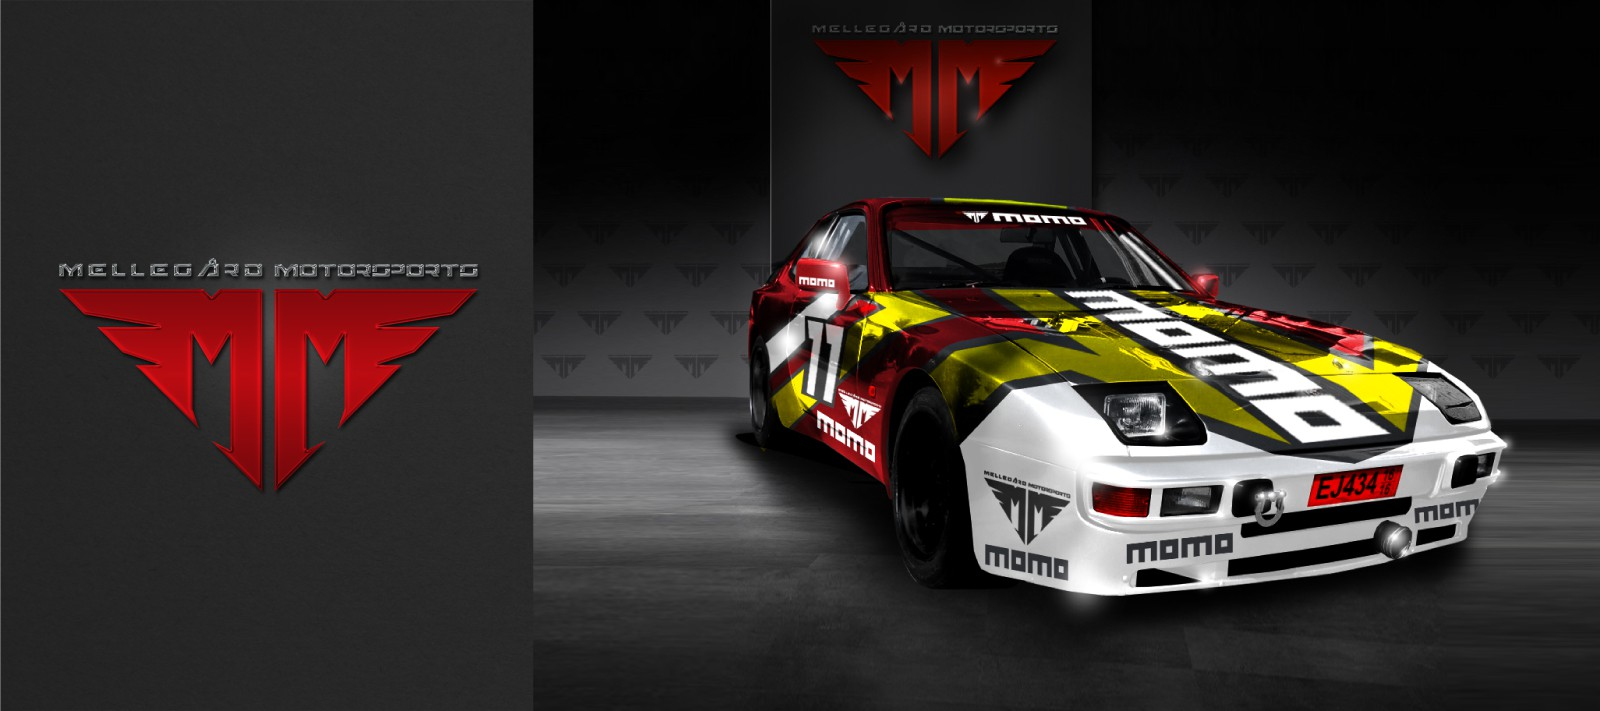 New design wanted for Mellegard Motorsport